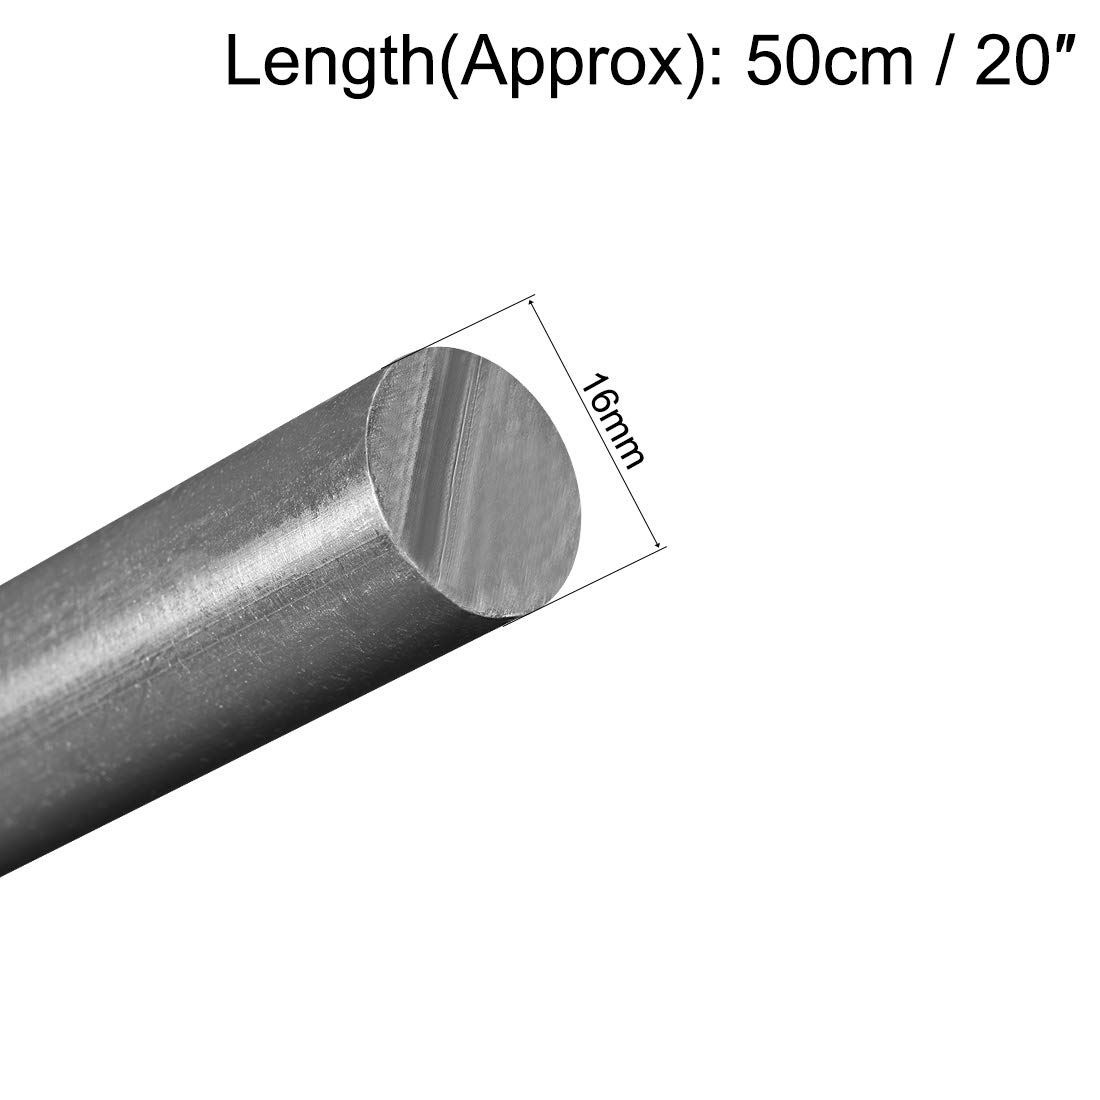 PVC Dia sourcing map Plastic Round Rod 10.5mm 20 Length Polyvinyl Chloride Rods,3//8 Grey Engineering Plastic Rod 2pcs